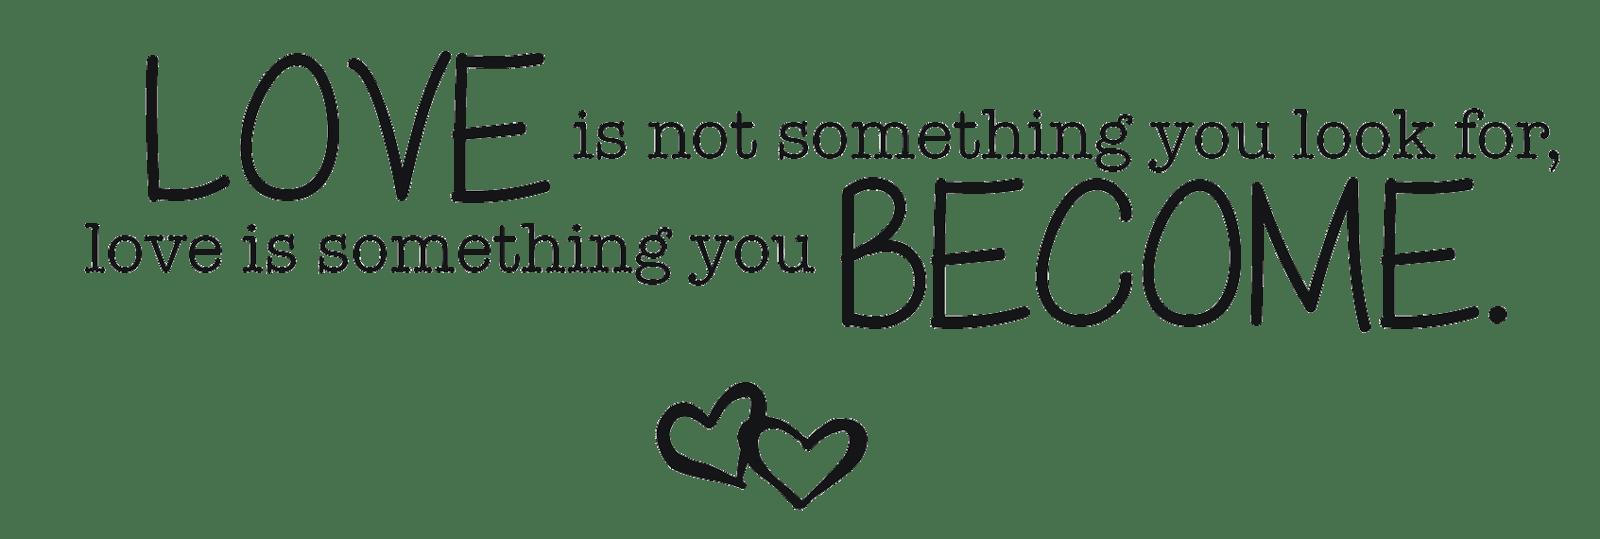 Book Quotes Wallpaper Cursive Love Quotes Png Transparent Love Quotes Png Images Pluspng